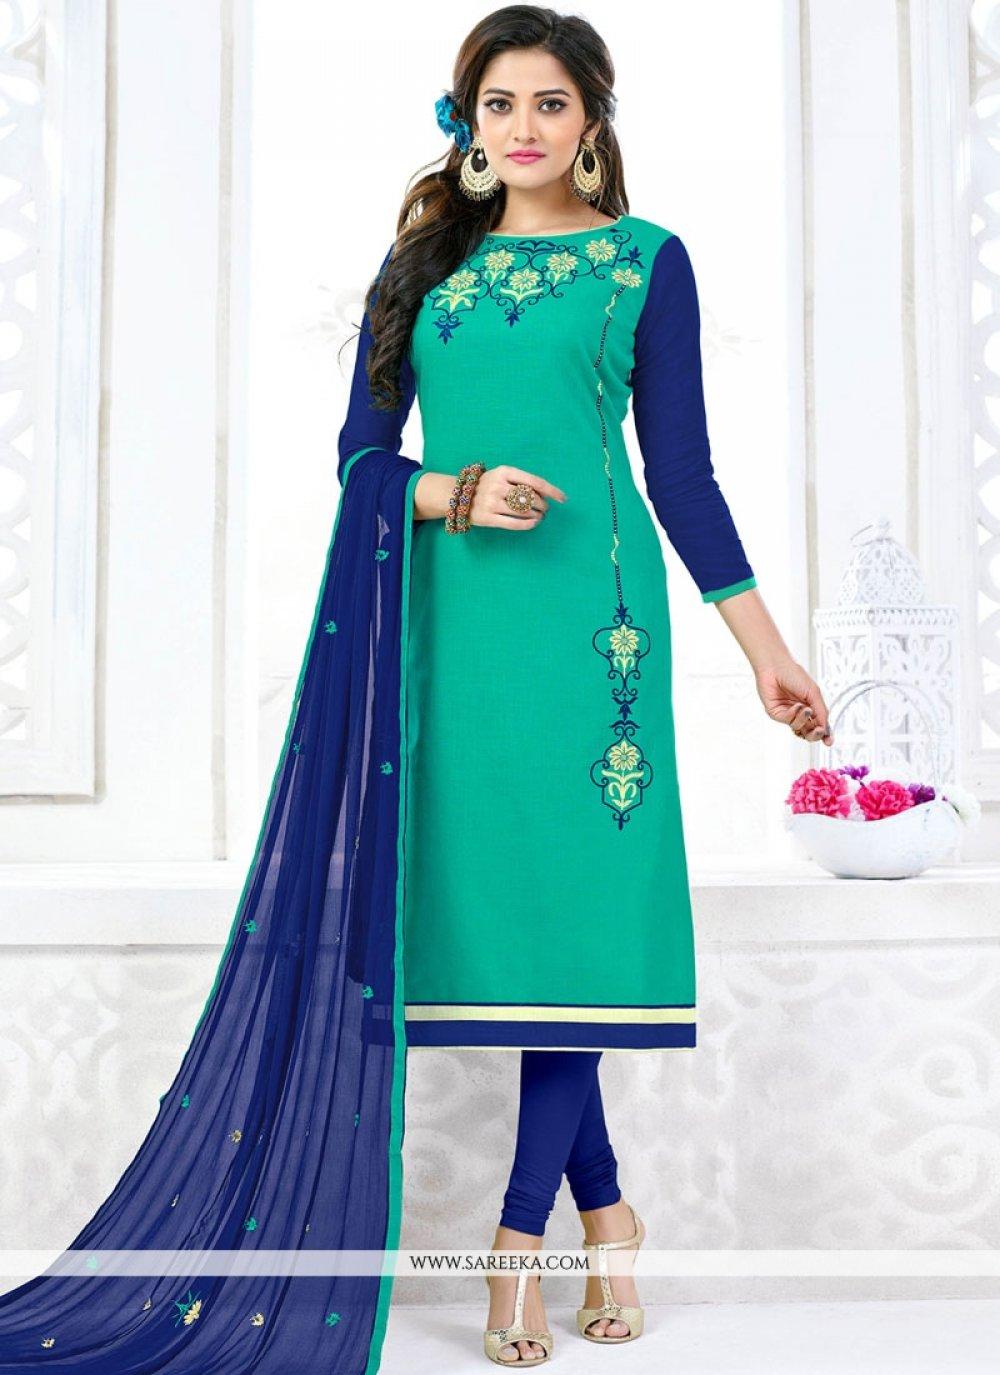 Sea Green Lace Work Churidar Suit